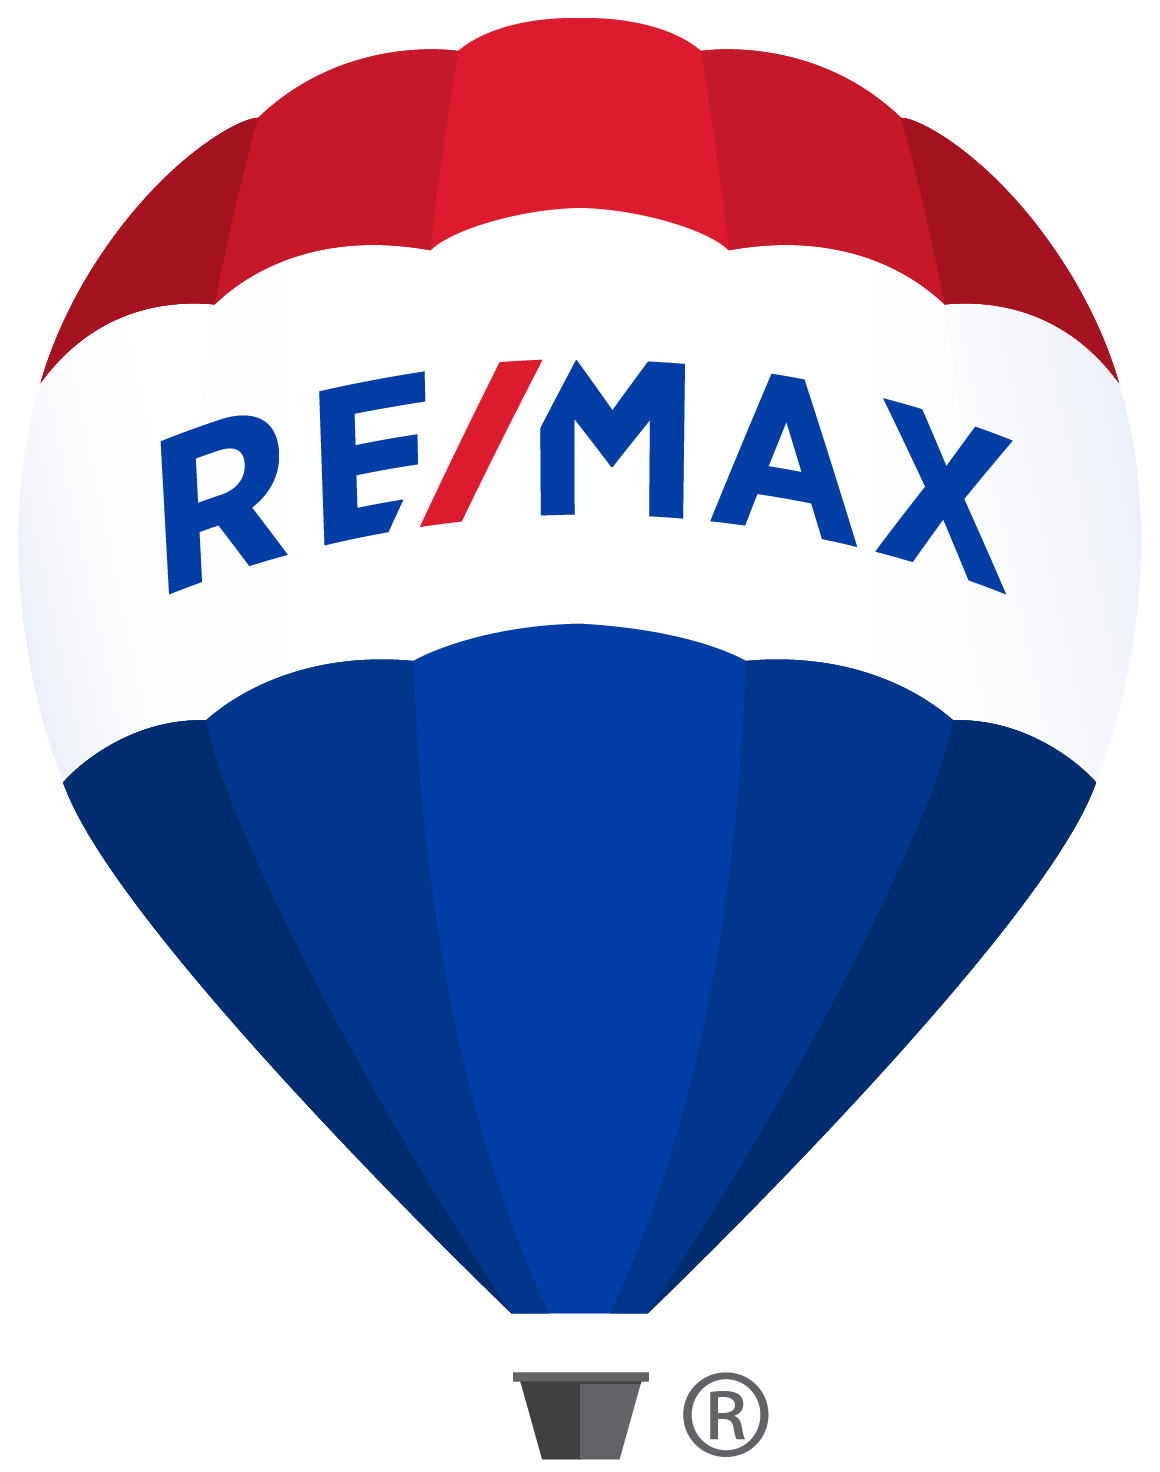 REMAX-balloon-logo-joshua-elliott.png